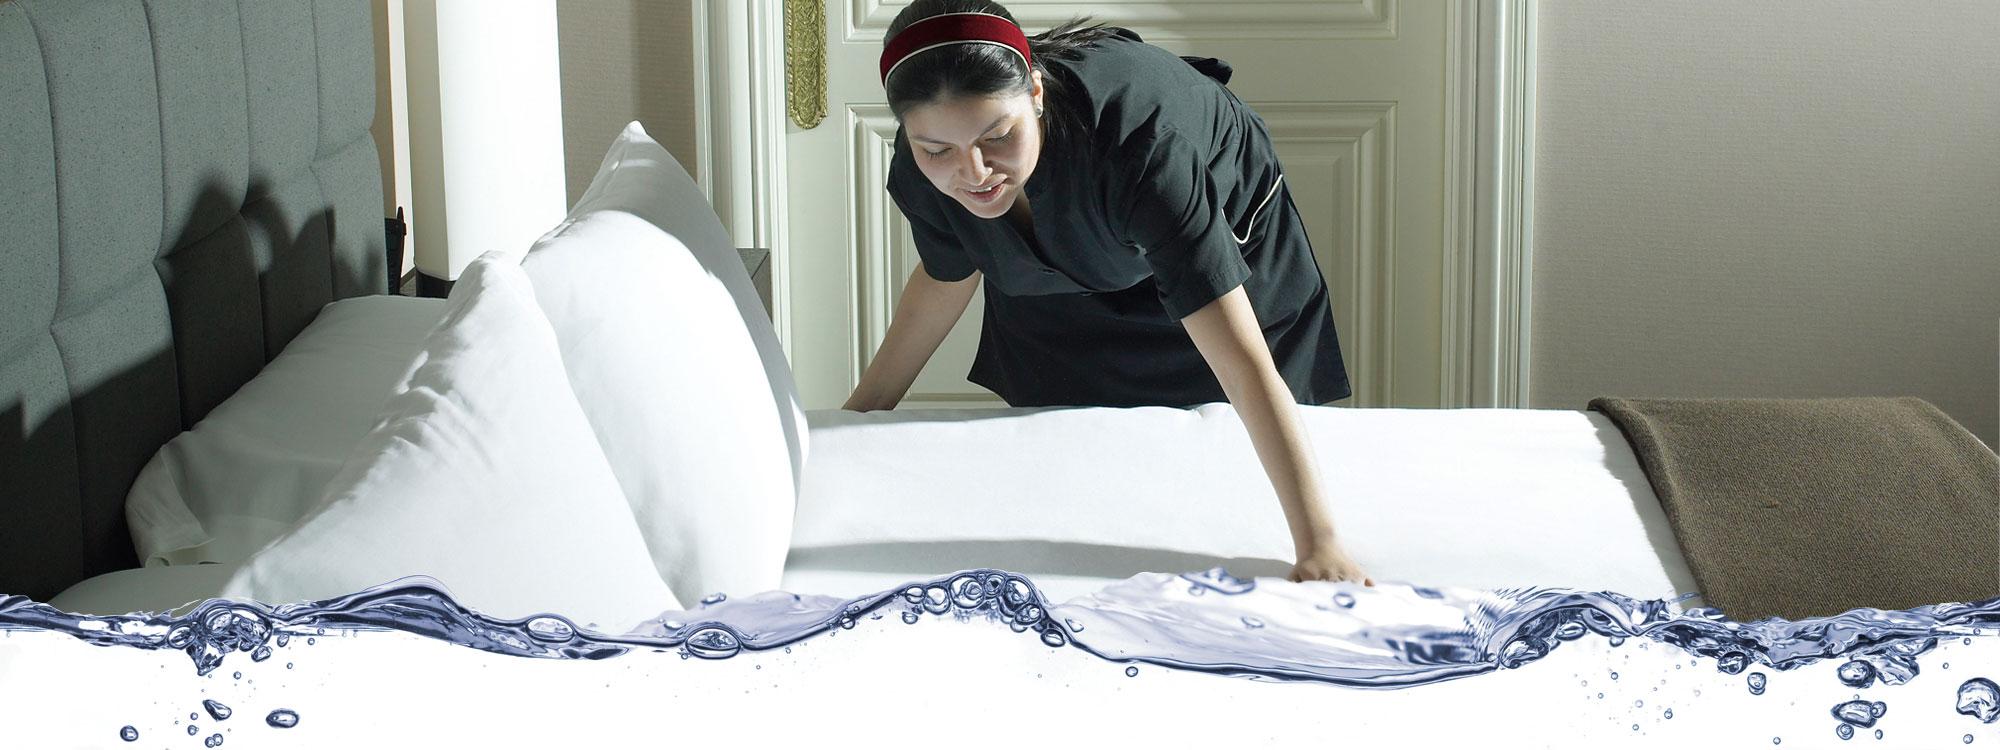 industrial ironing equipment